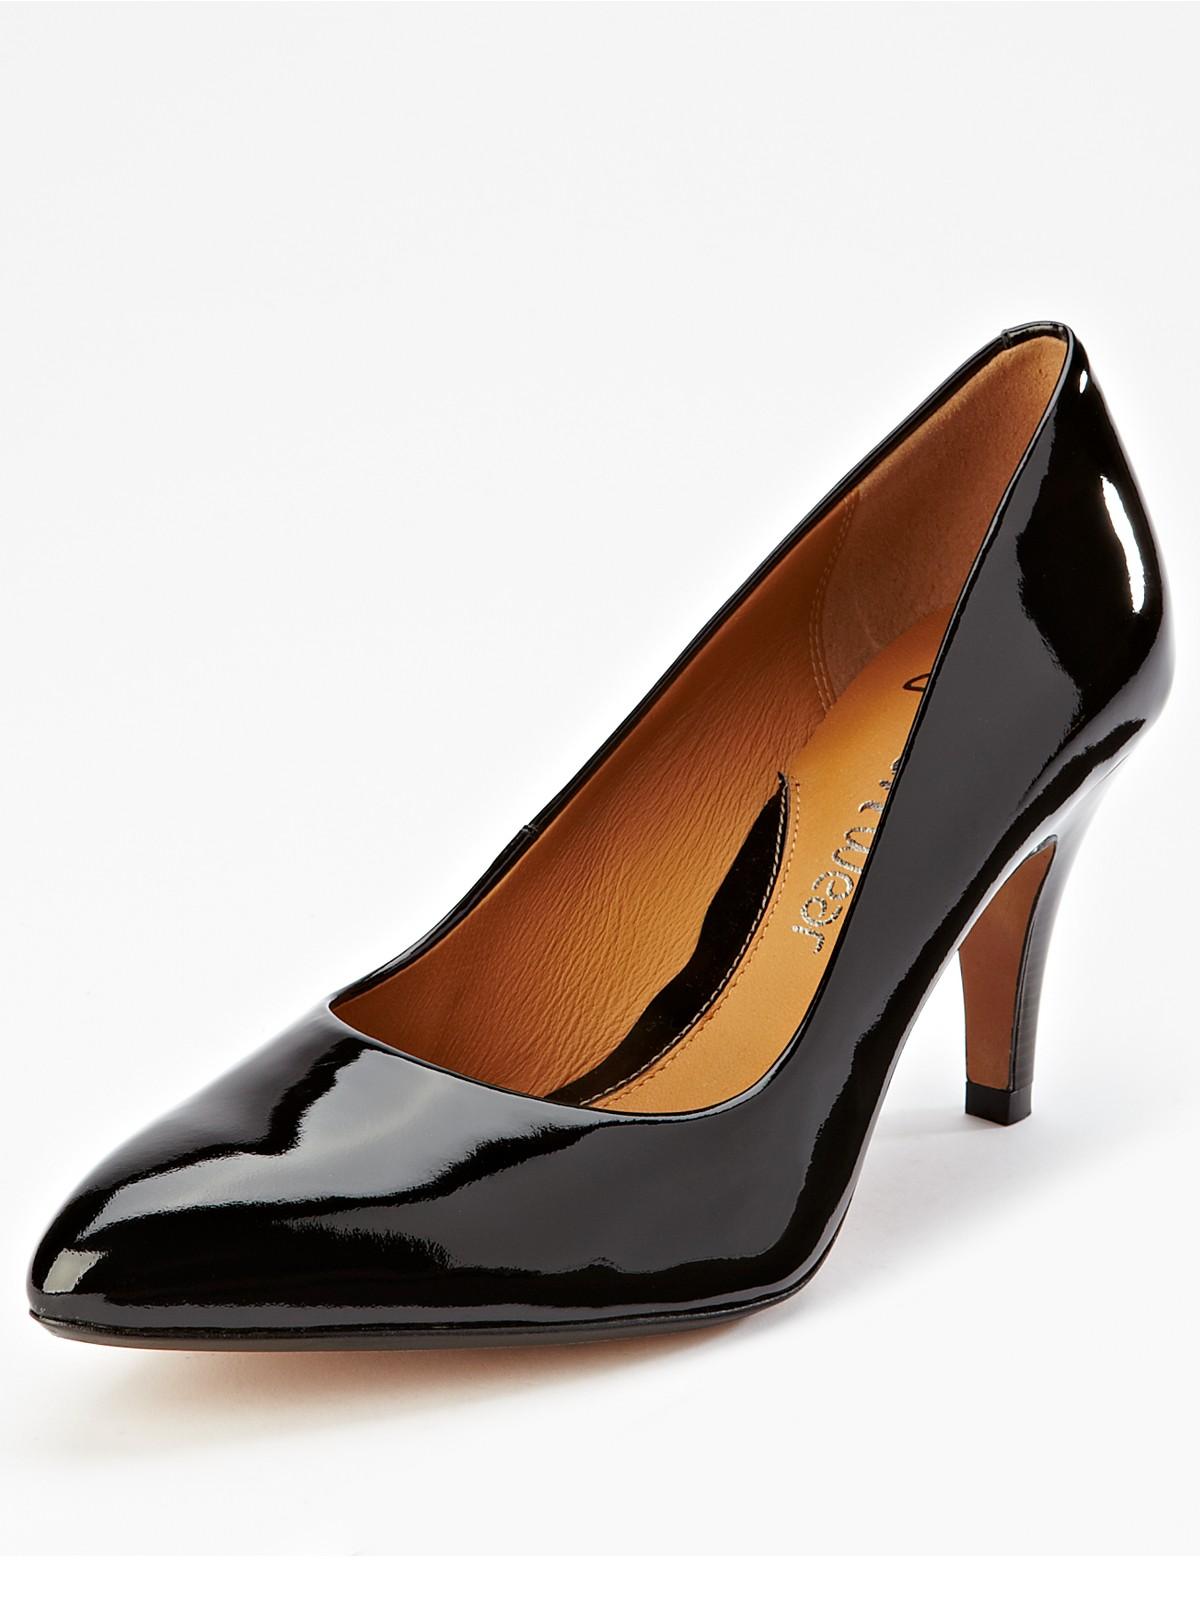 clarks clarks cedar chest patent stiletto shoes black in